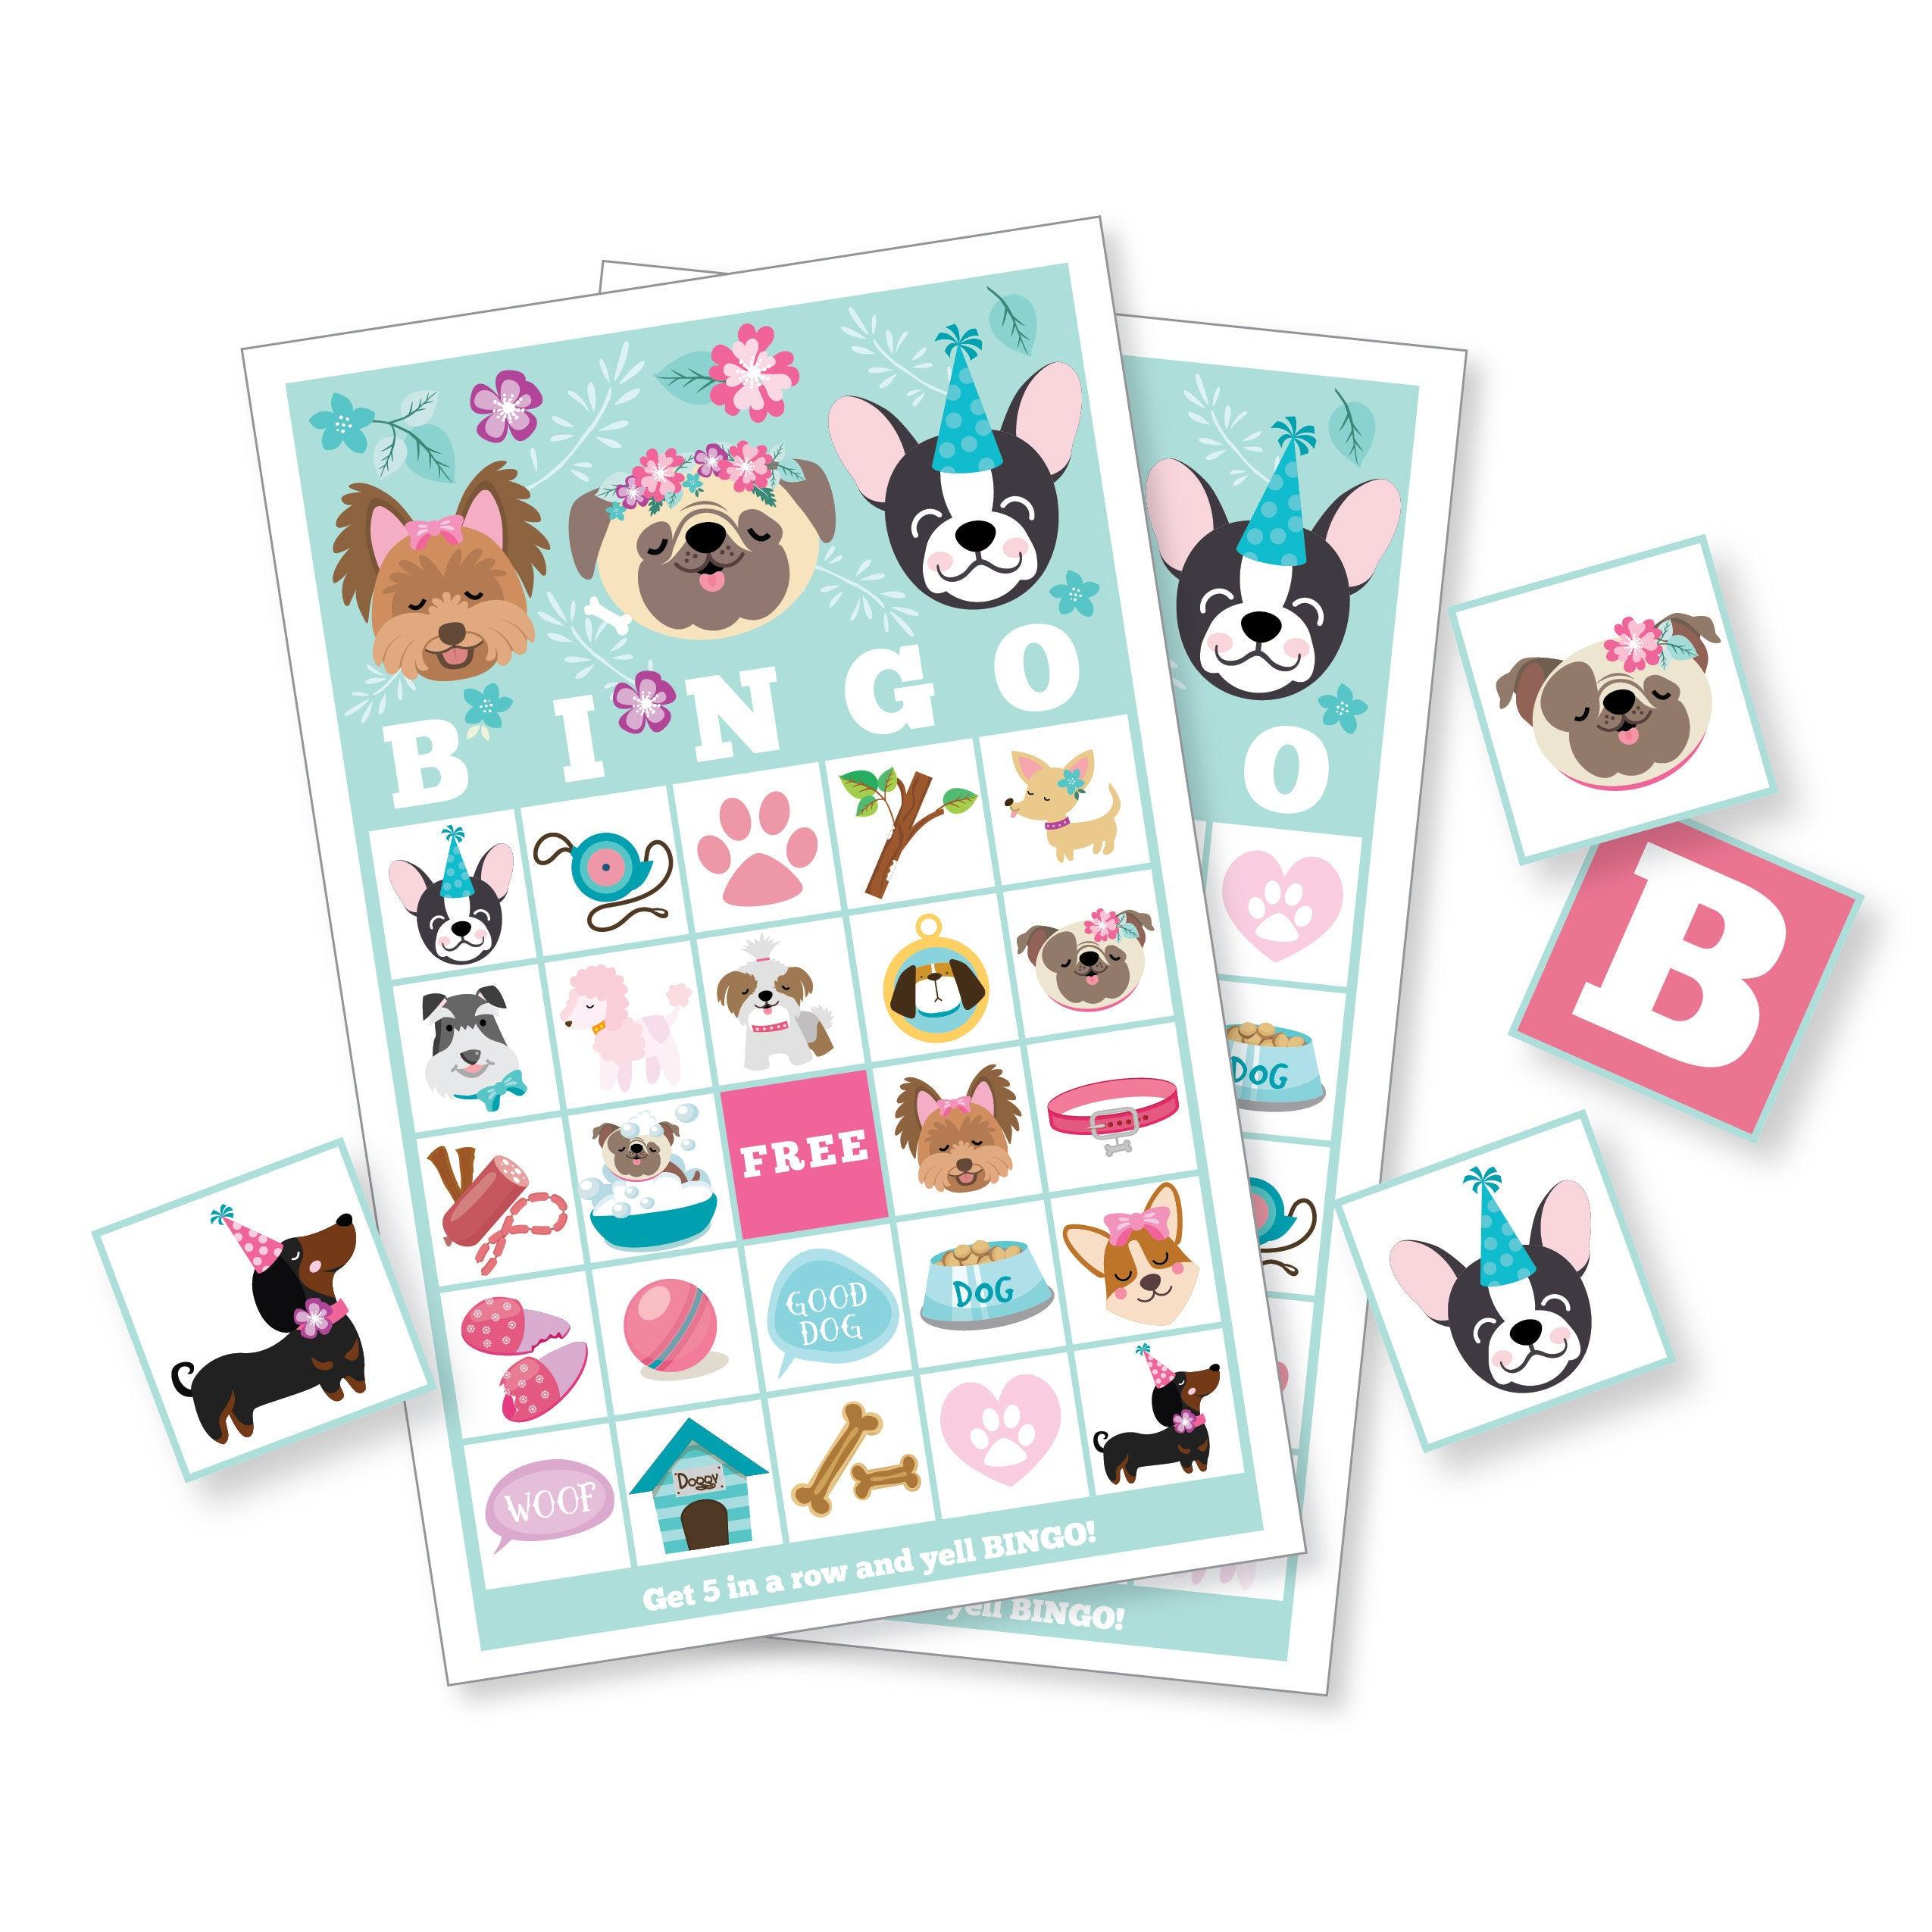 Dog Bingo Game - Pug - Puppy - Dog Party Game, Girl's